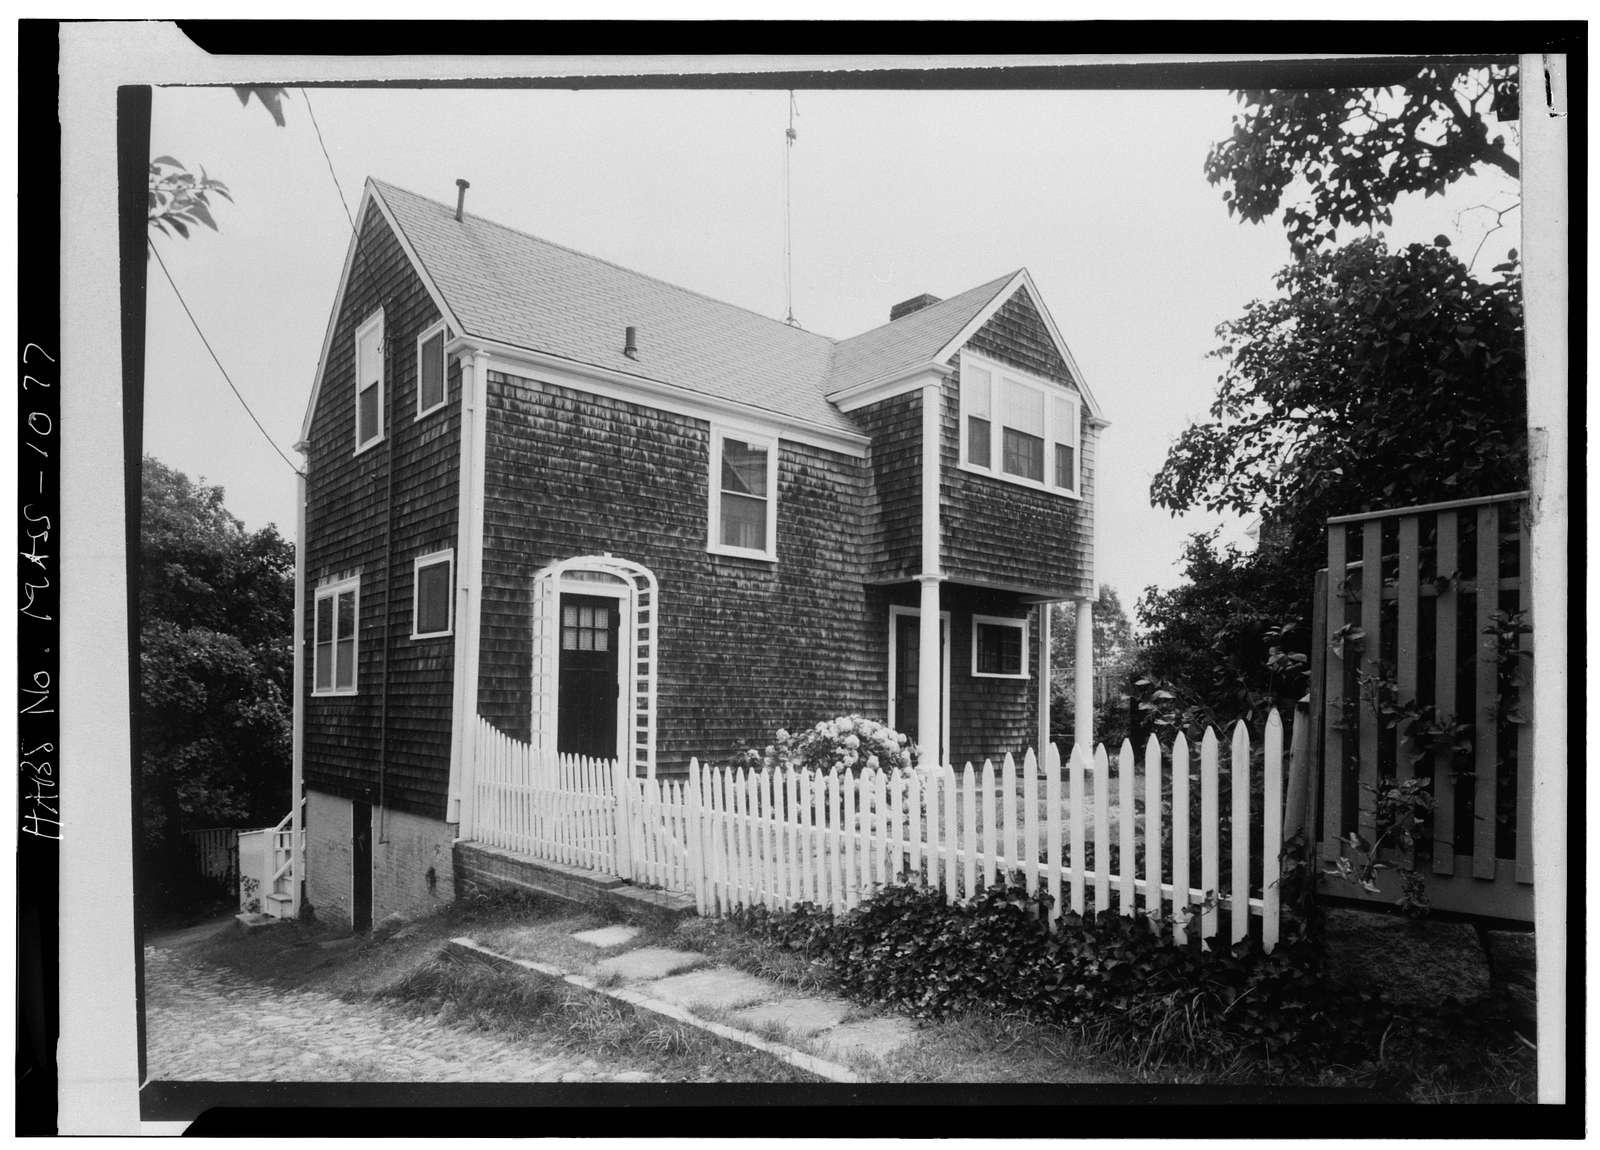 George B. Upton House, 2 Stone Alley, Nantucket, Nantucket County, MA